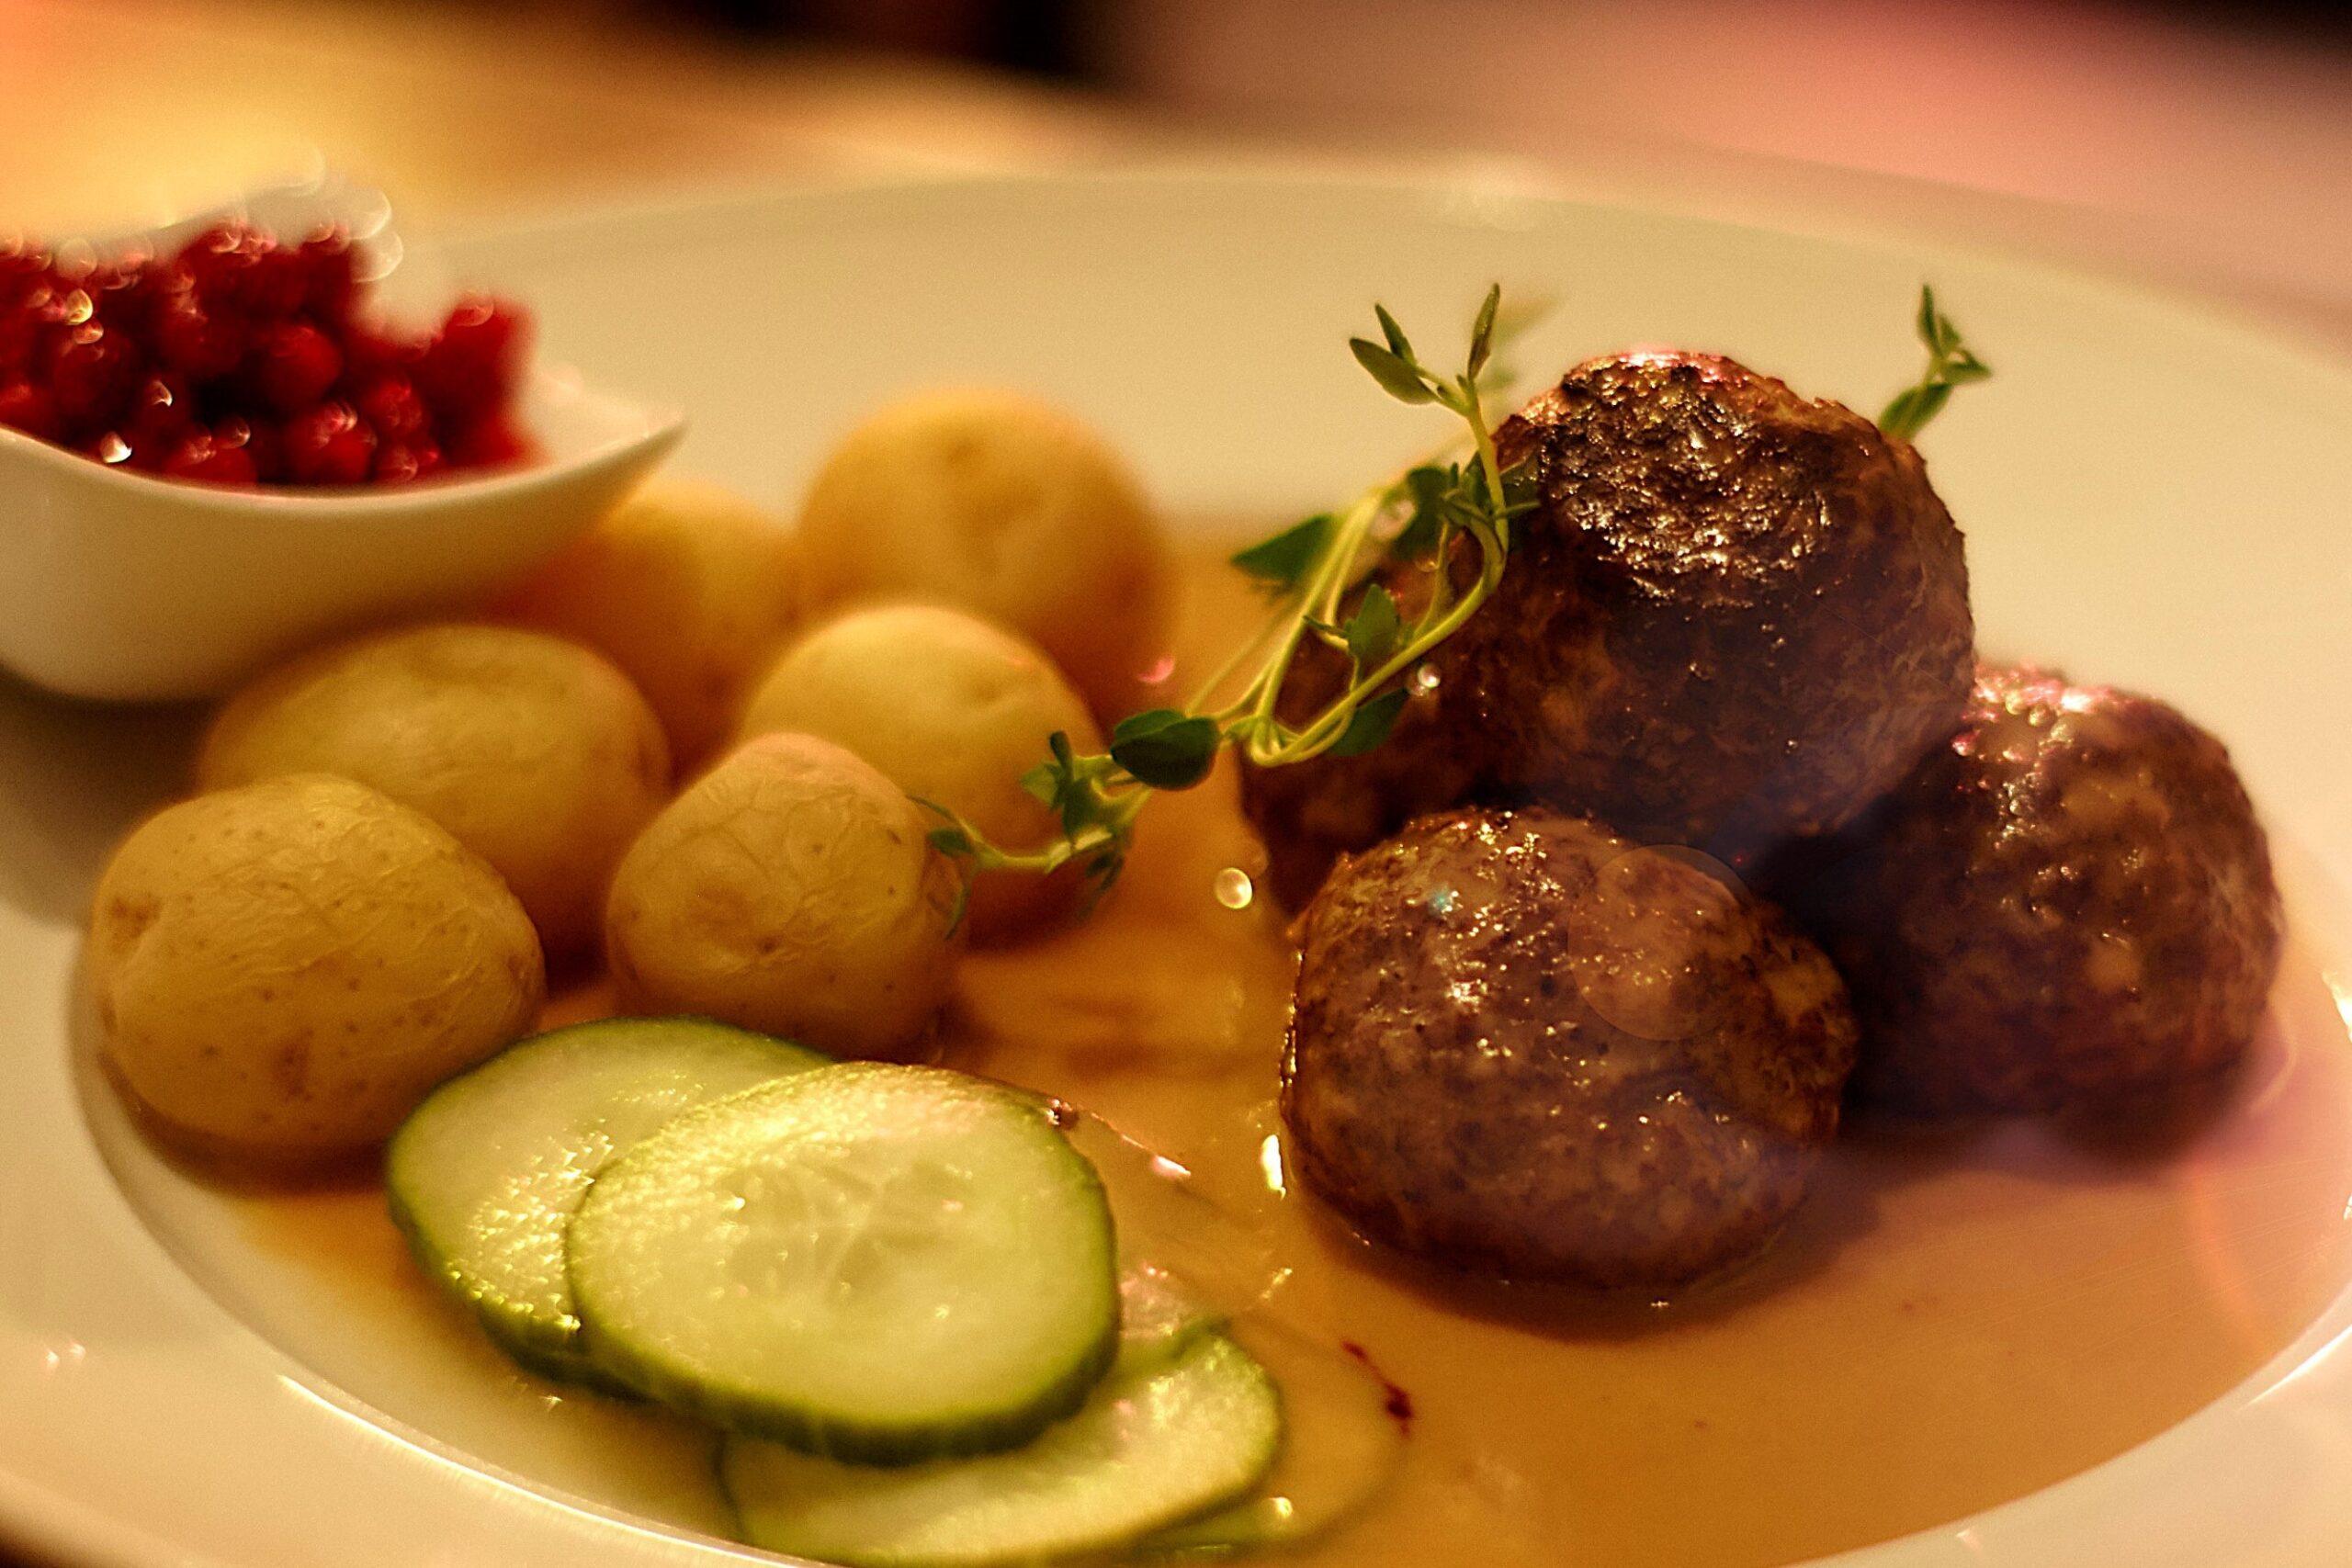 Lunch i Stockholm - Bistro Casper Vasastan